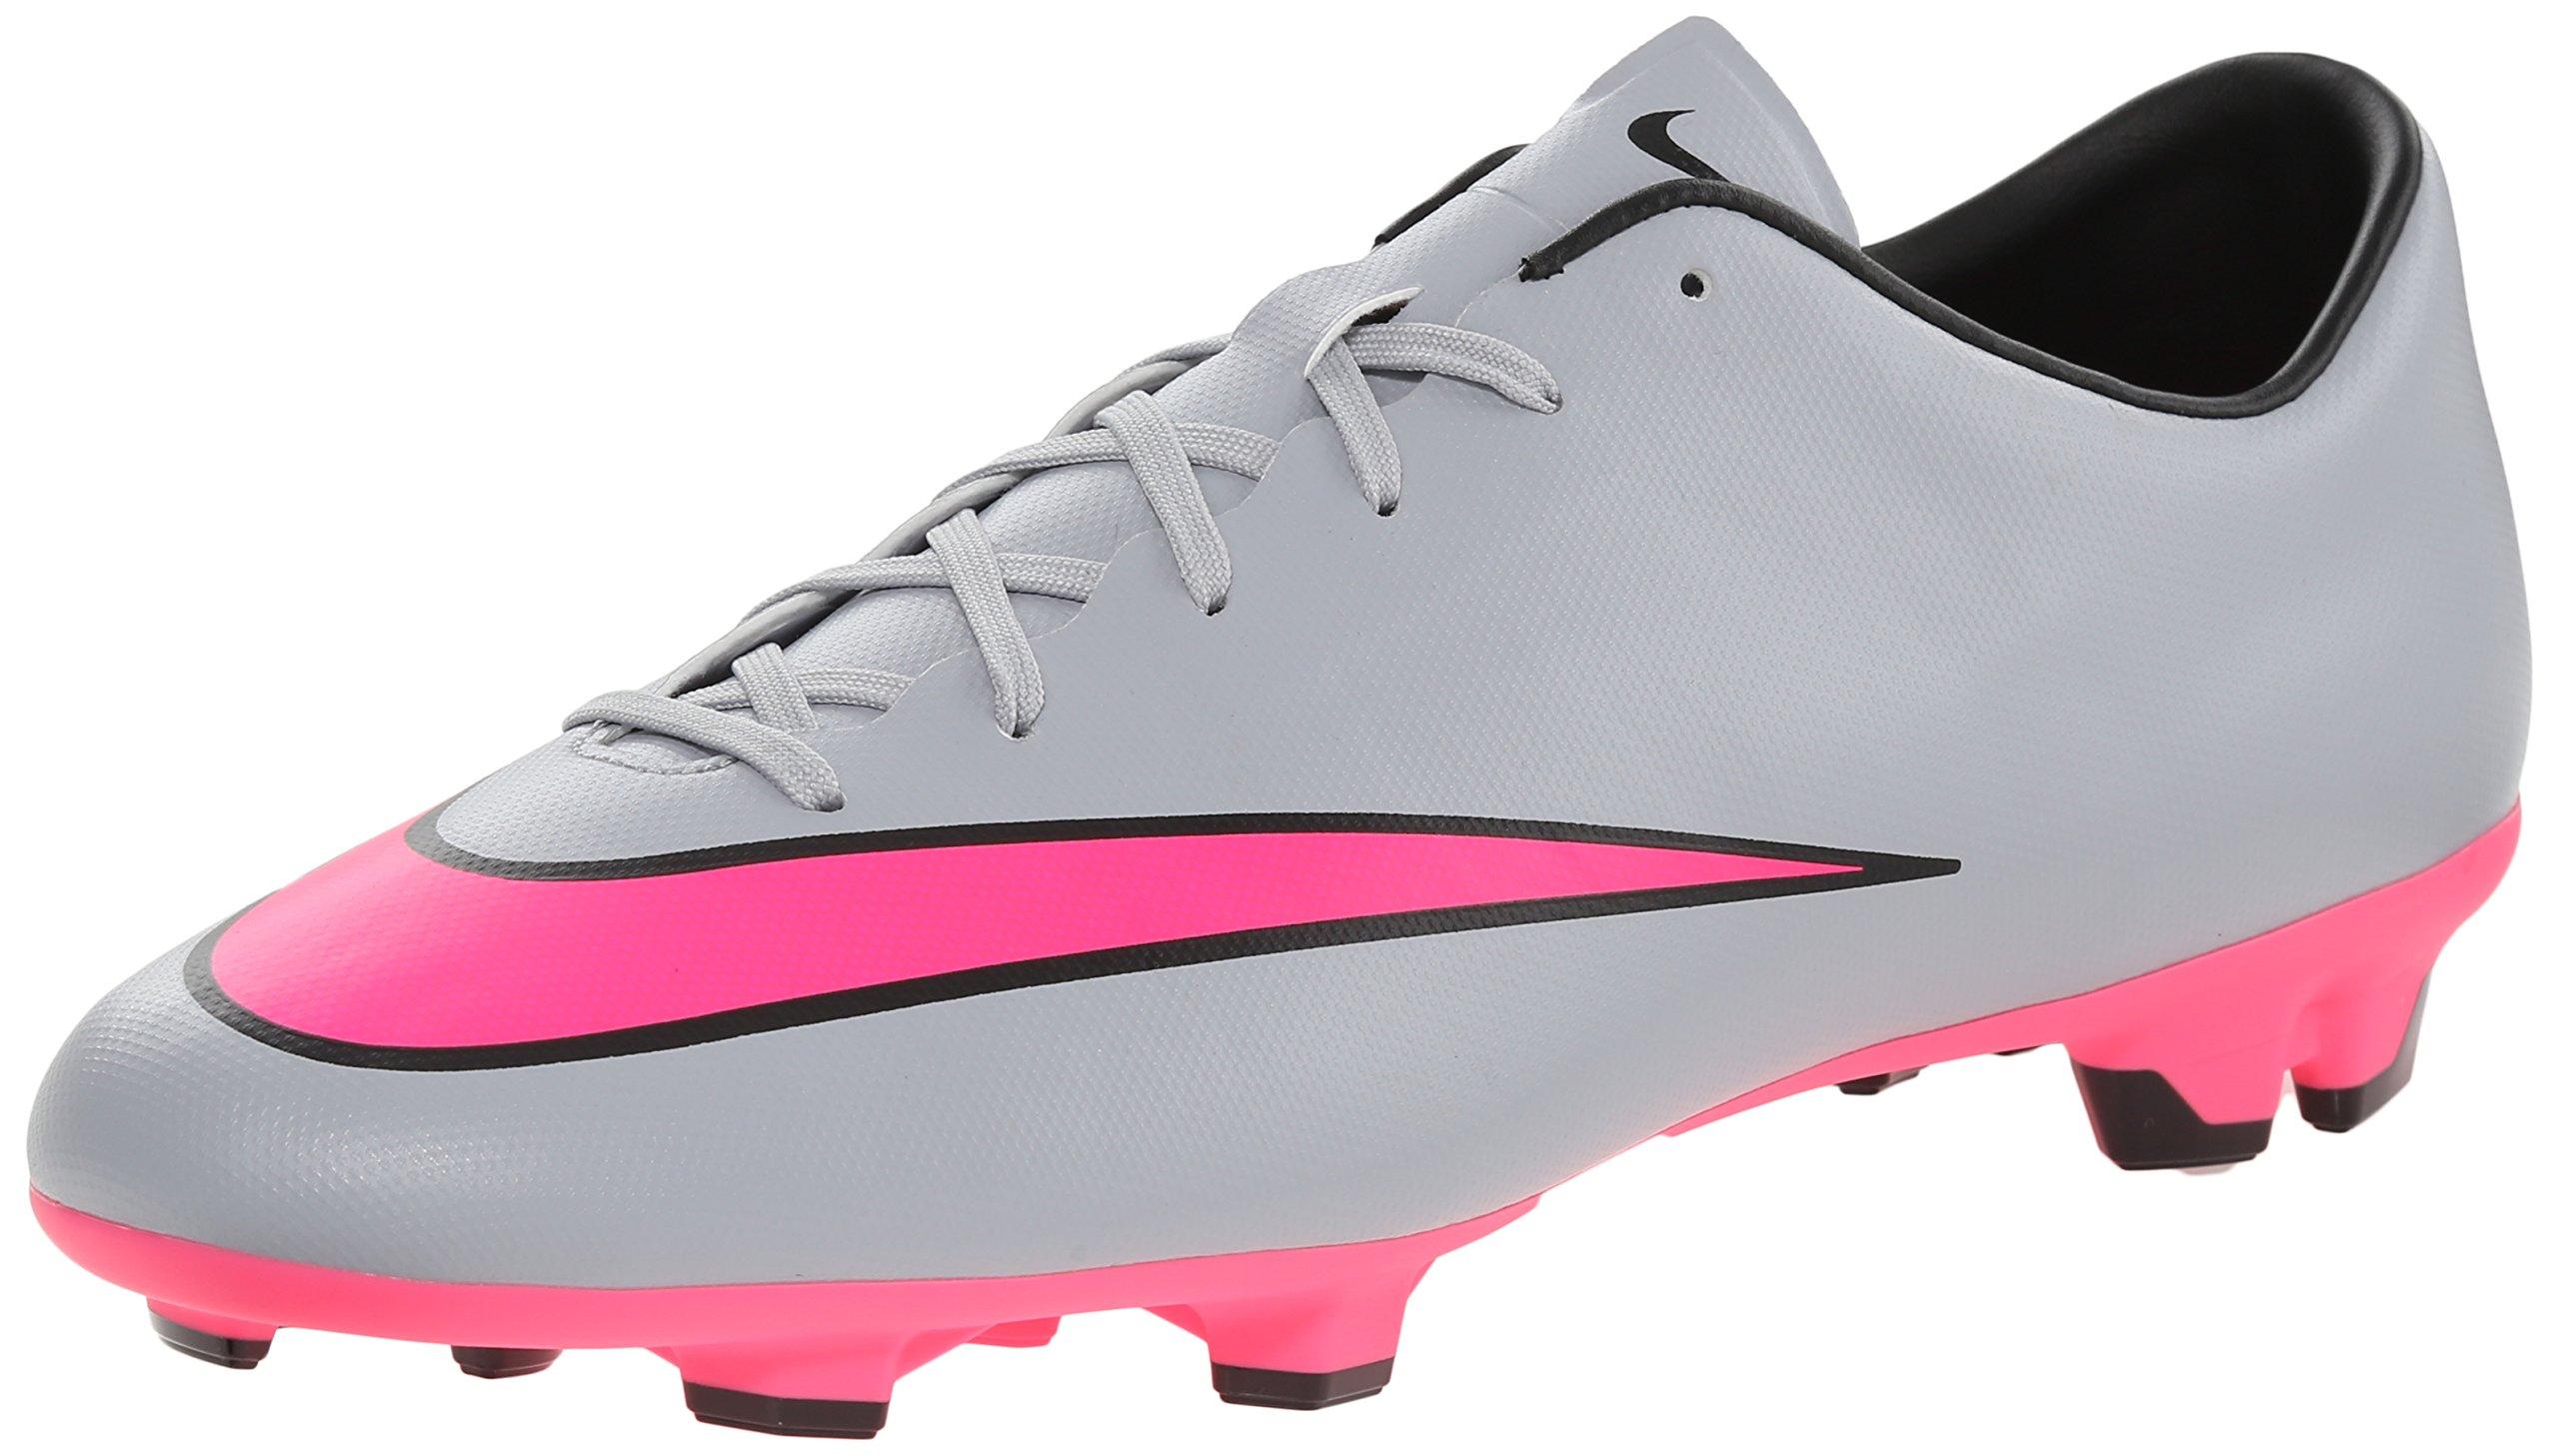 5522935c8f3d Galleon - Nike Men's Mercurial Victory V Fg Wolf Grey/Hyper Pink/Black/Blk Soccer  Cleat 8.5 Men US